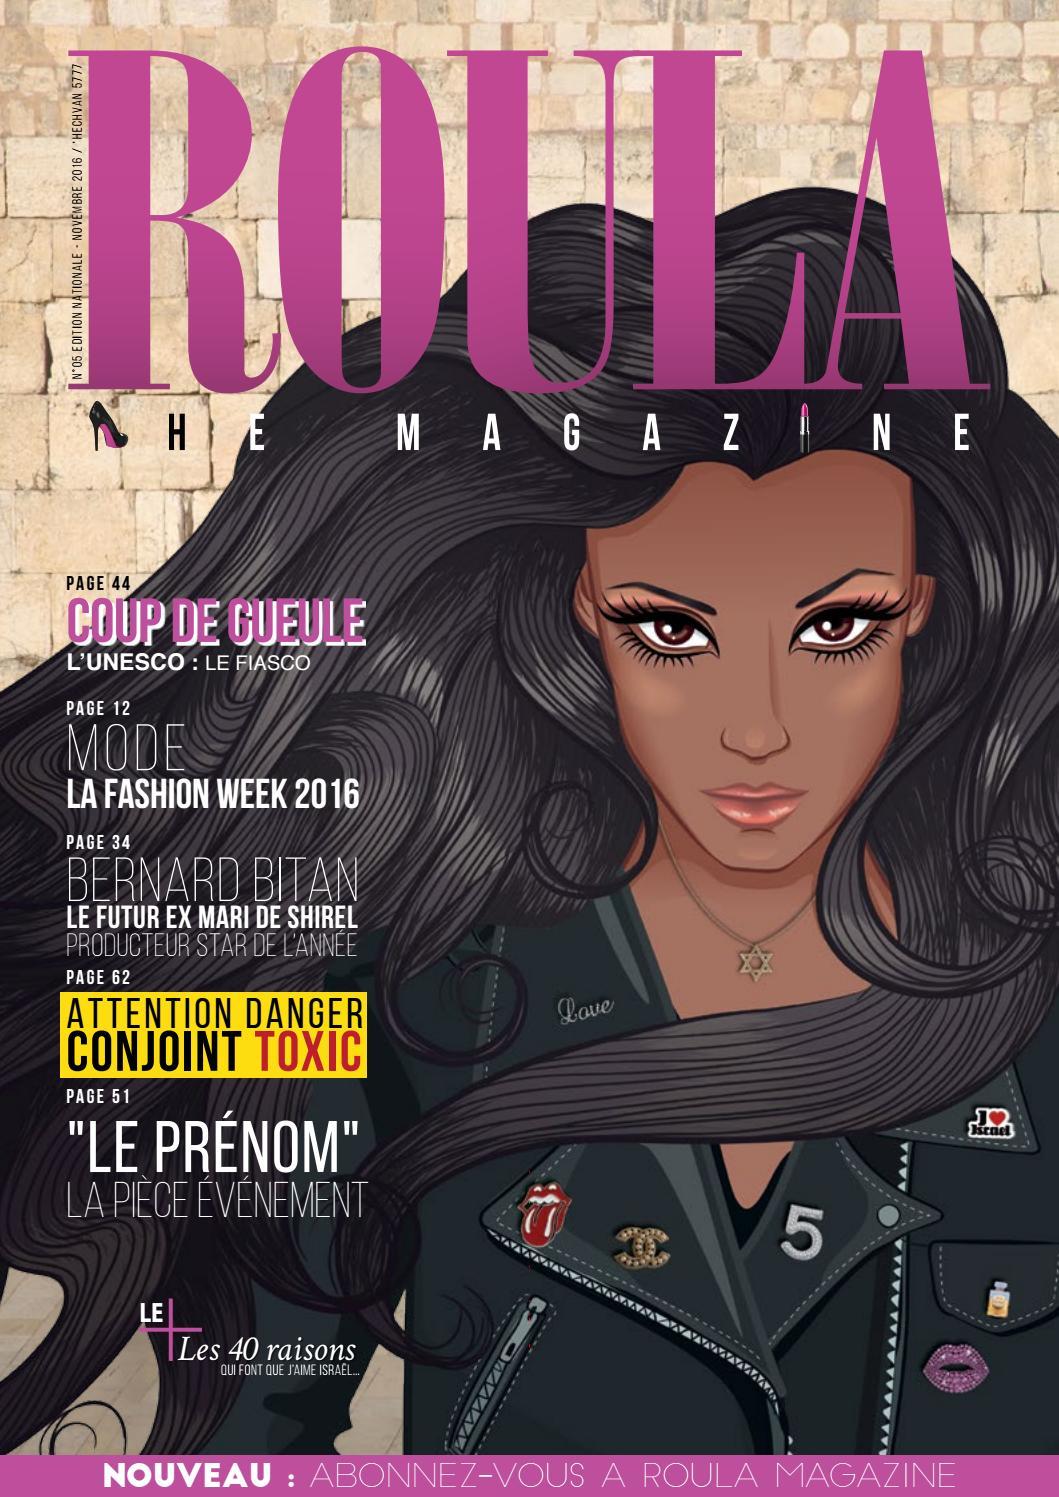 Roula Magazine n°5 by Golda Magazine - issuu